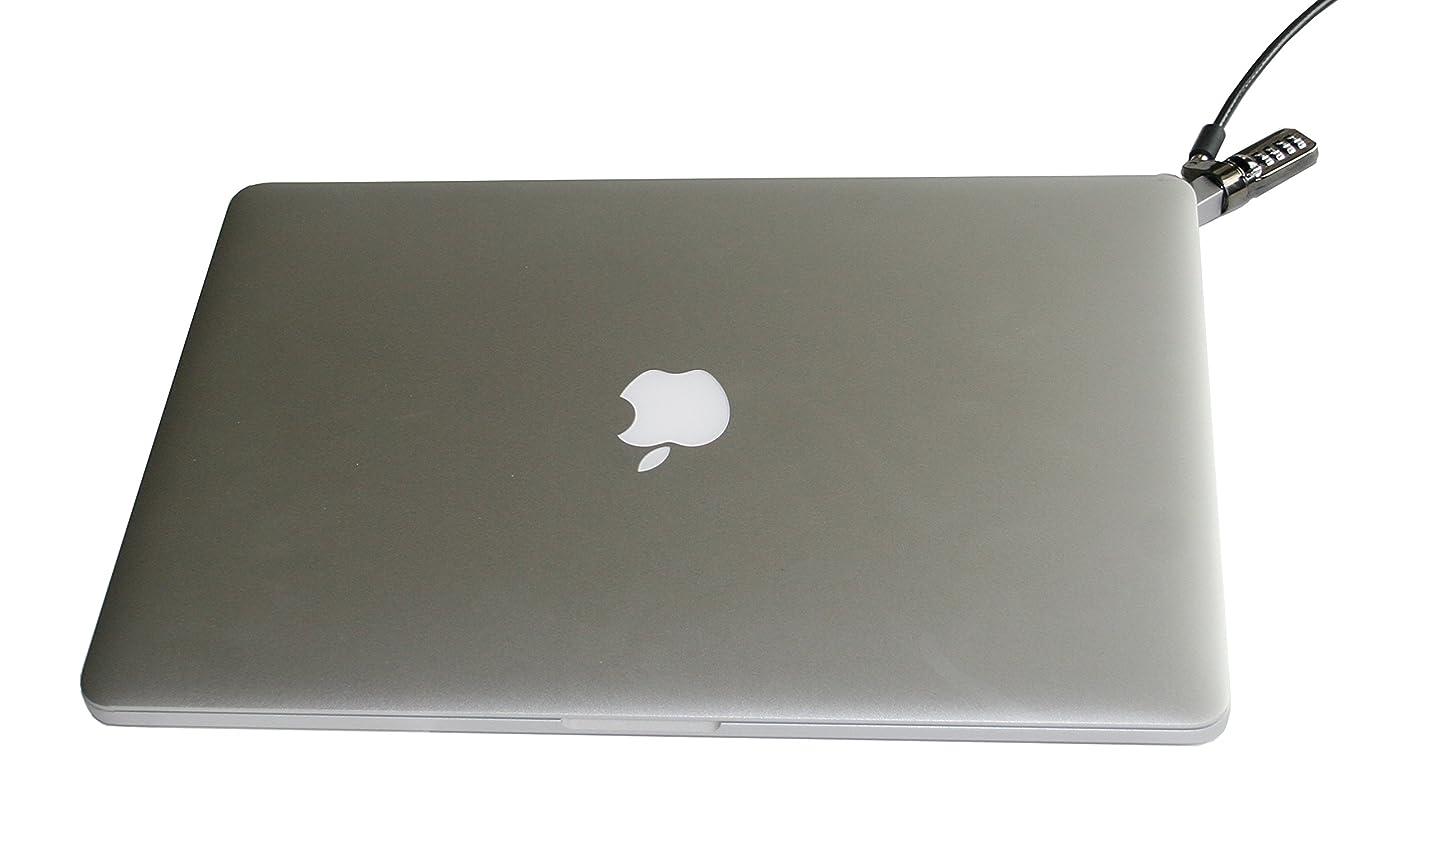 KGear Security Lock Bracket for Apple MacBook Pro Retina 13